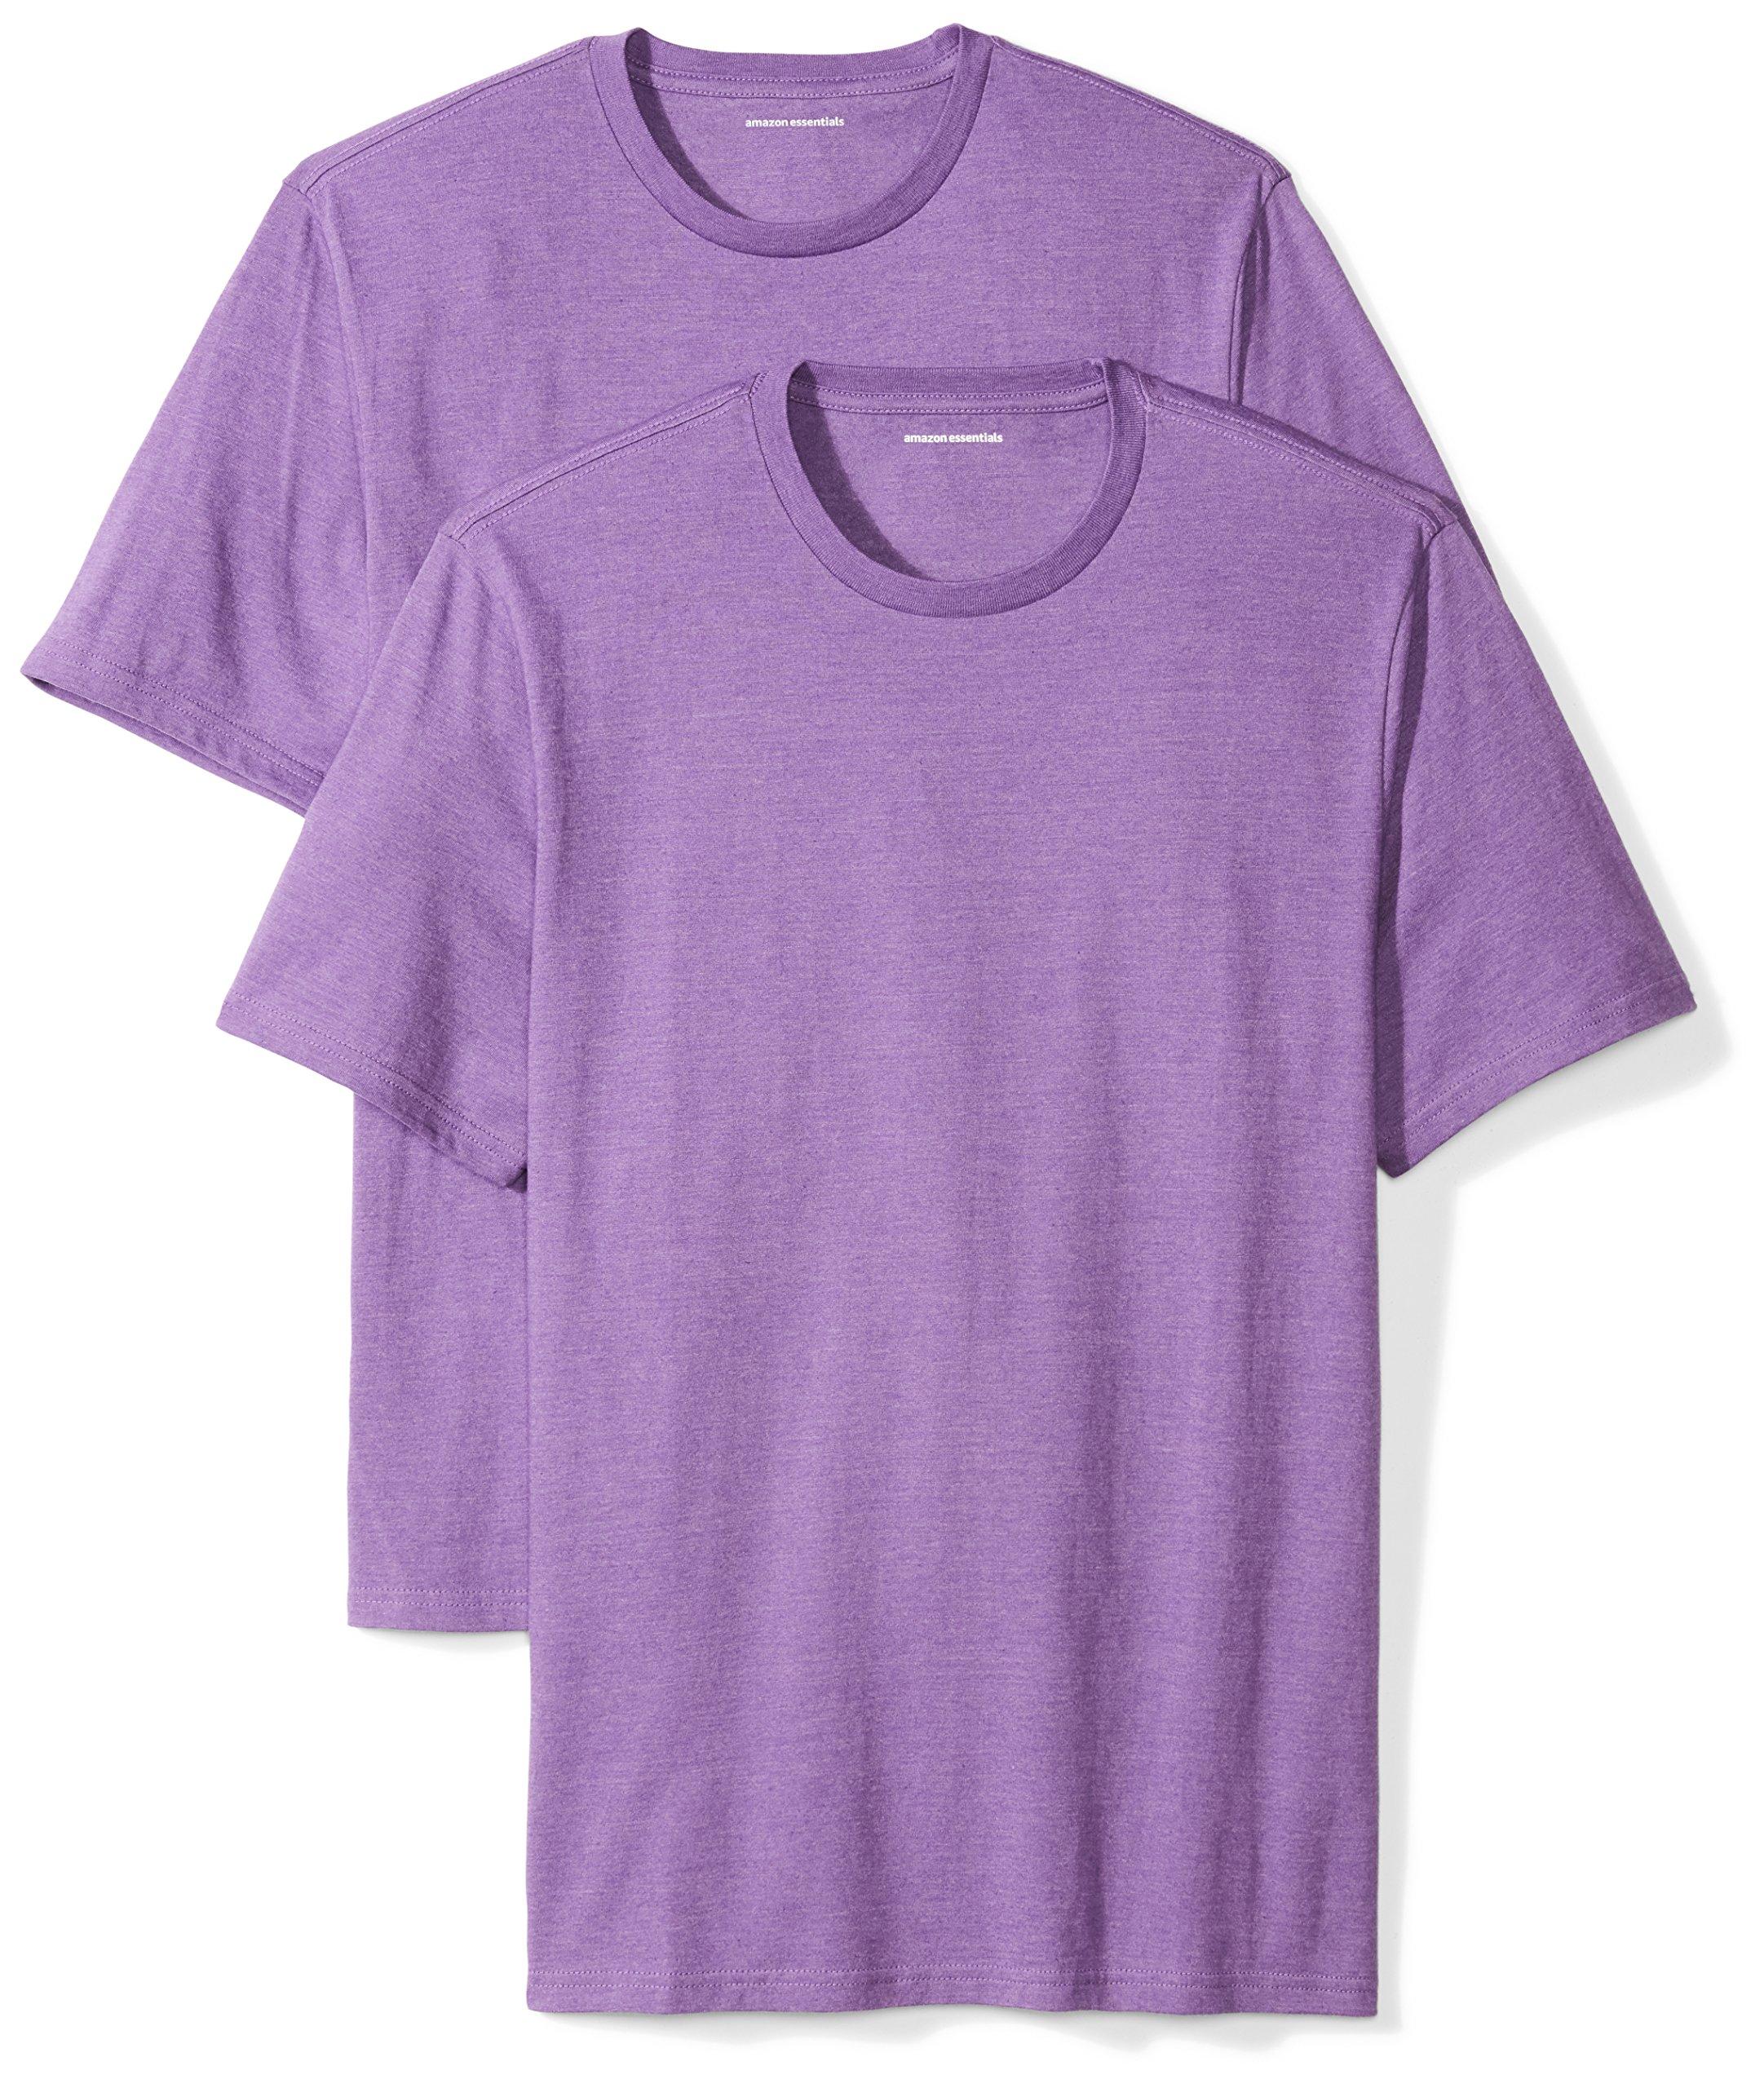 fed550e4d Galleon - Amazon Essentials Men's 2-Pack Loose-Fit Short-Sleeve Crewneck T- Shirts, Purple Heather, X-Large